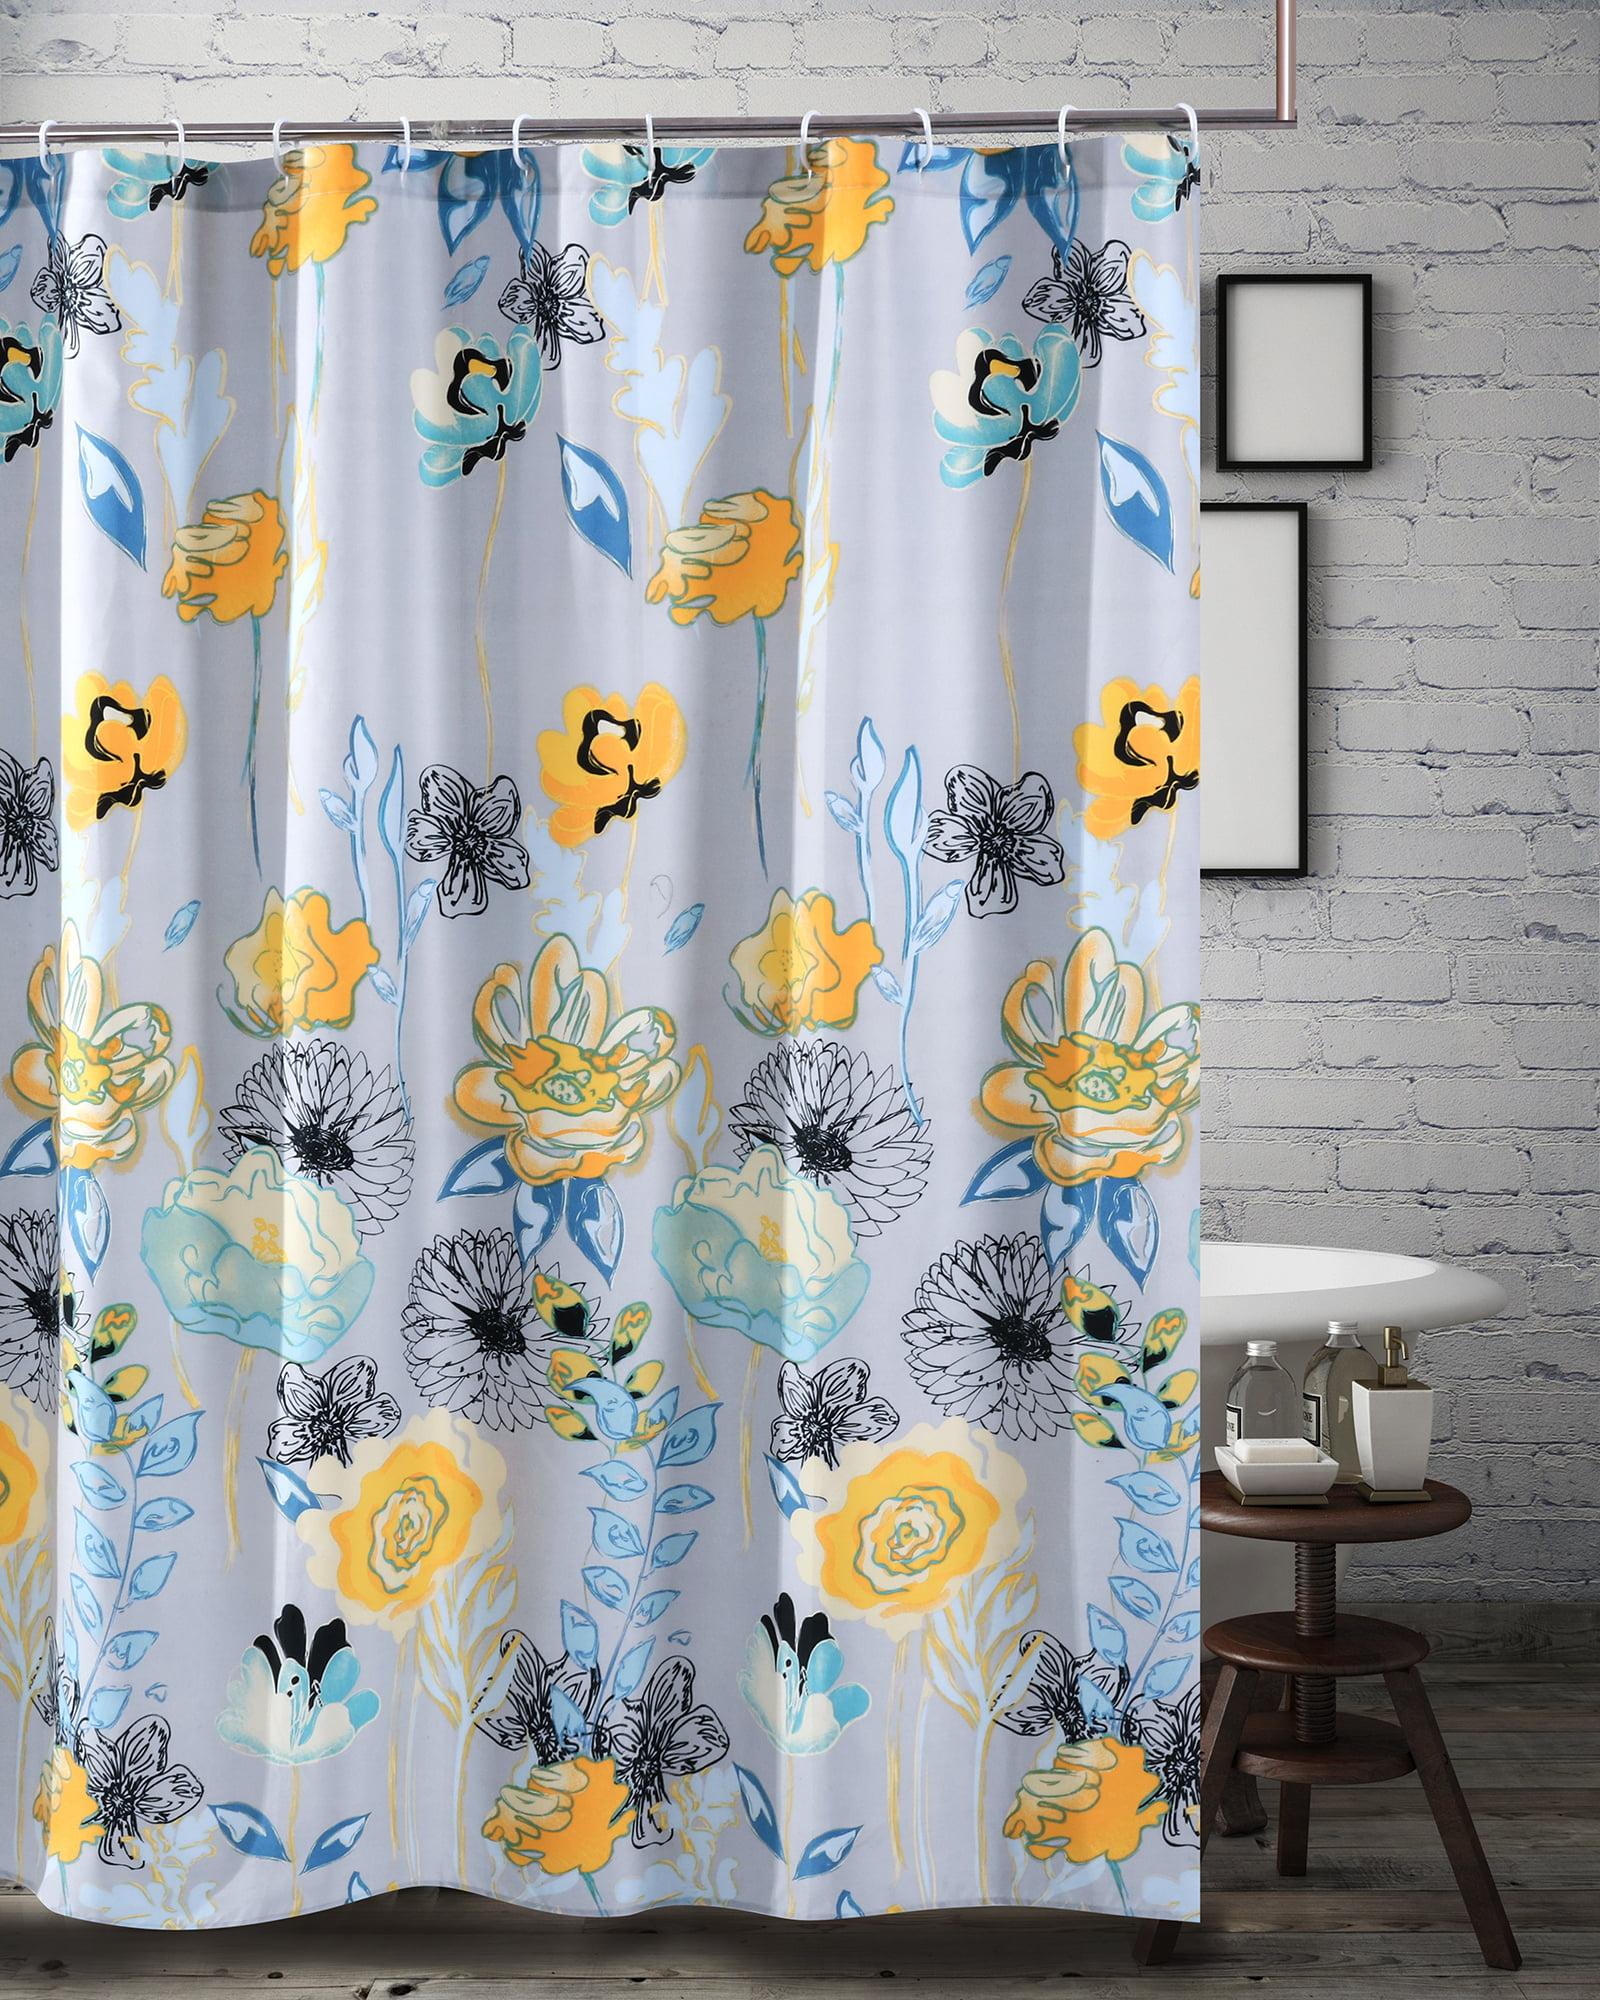 72x72-inch Greenland Home Moose Creek Shower Curtain Multi